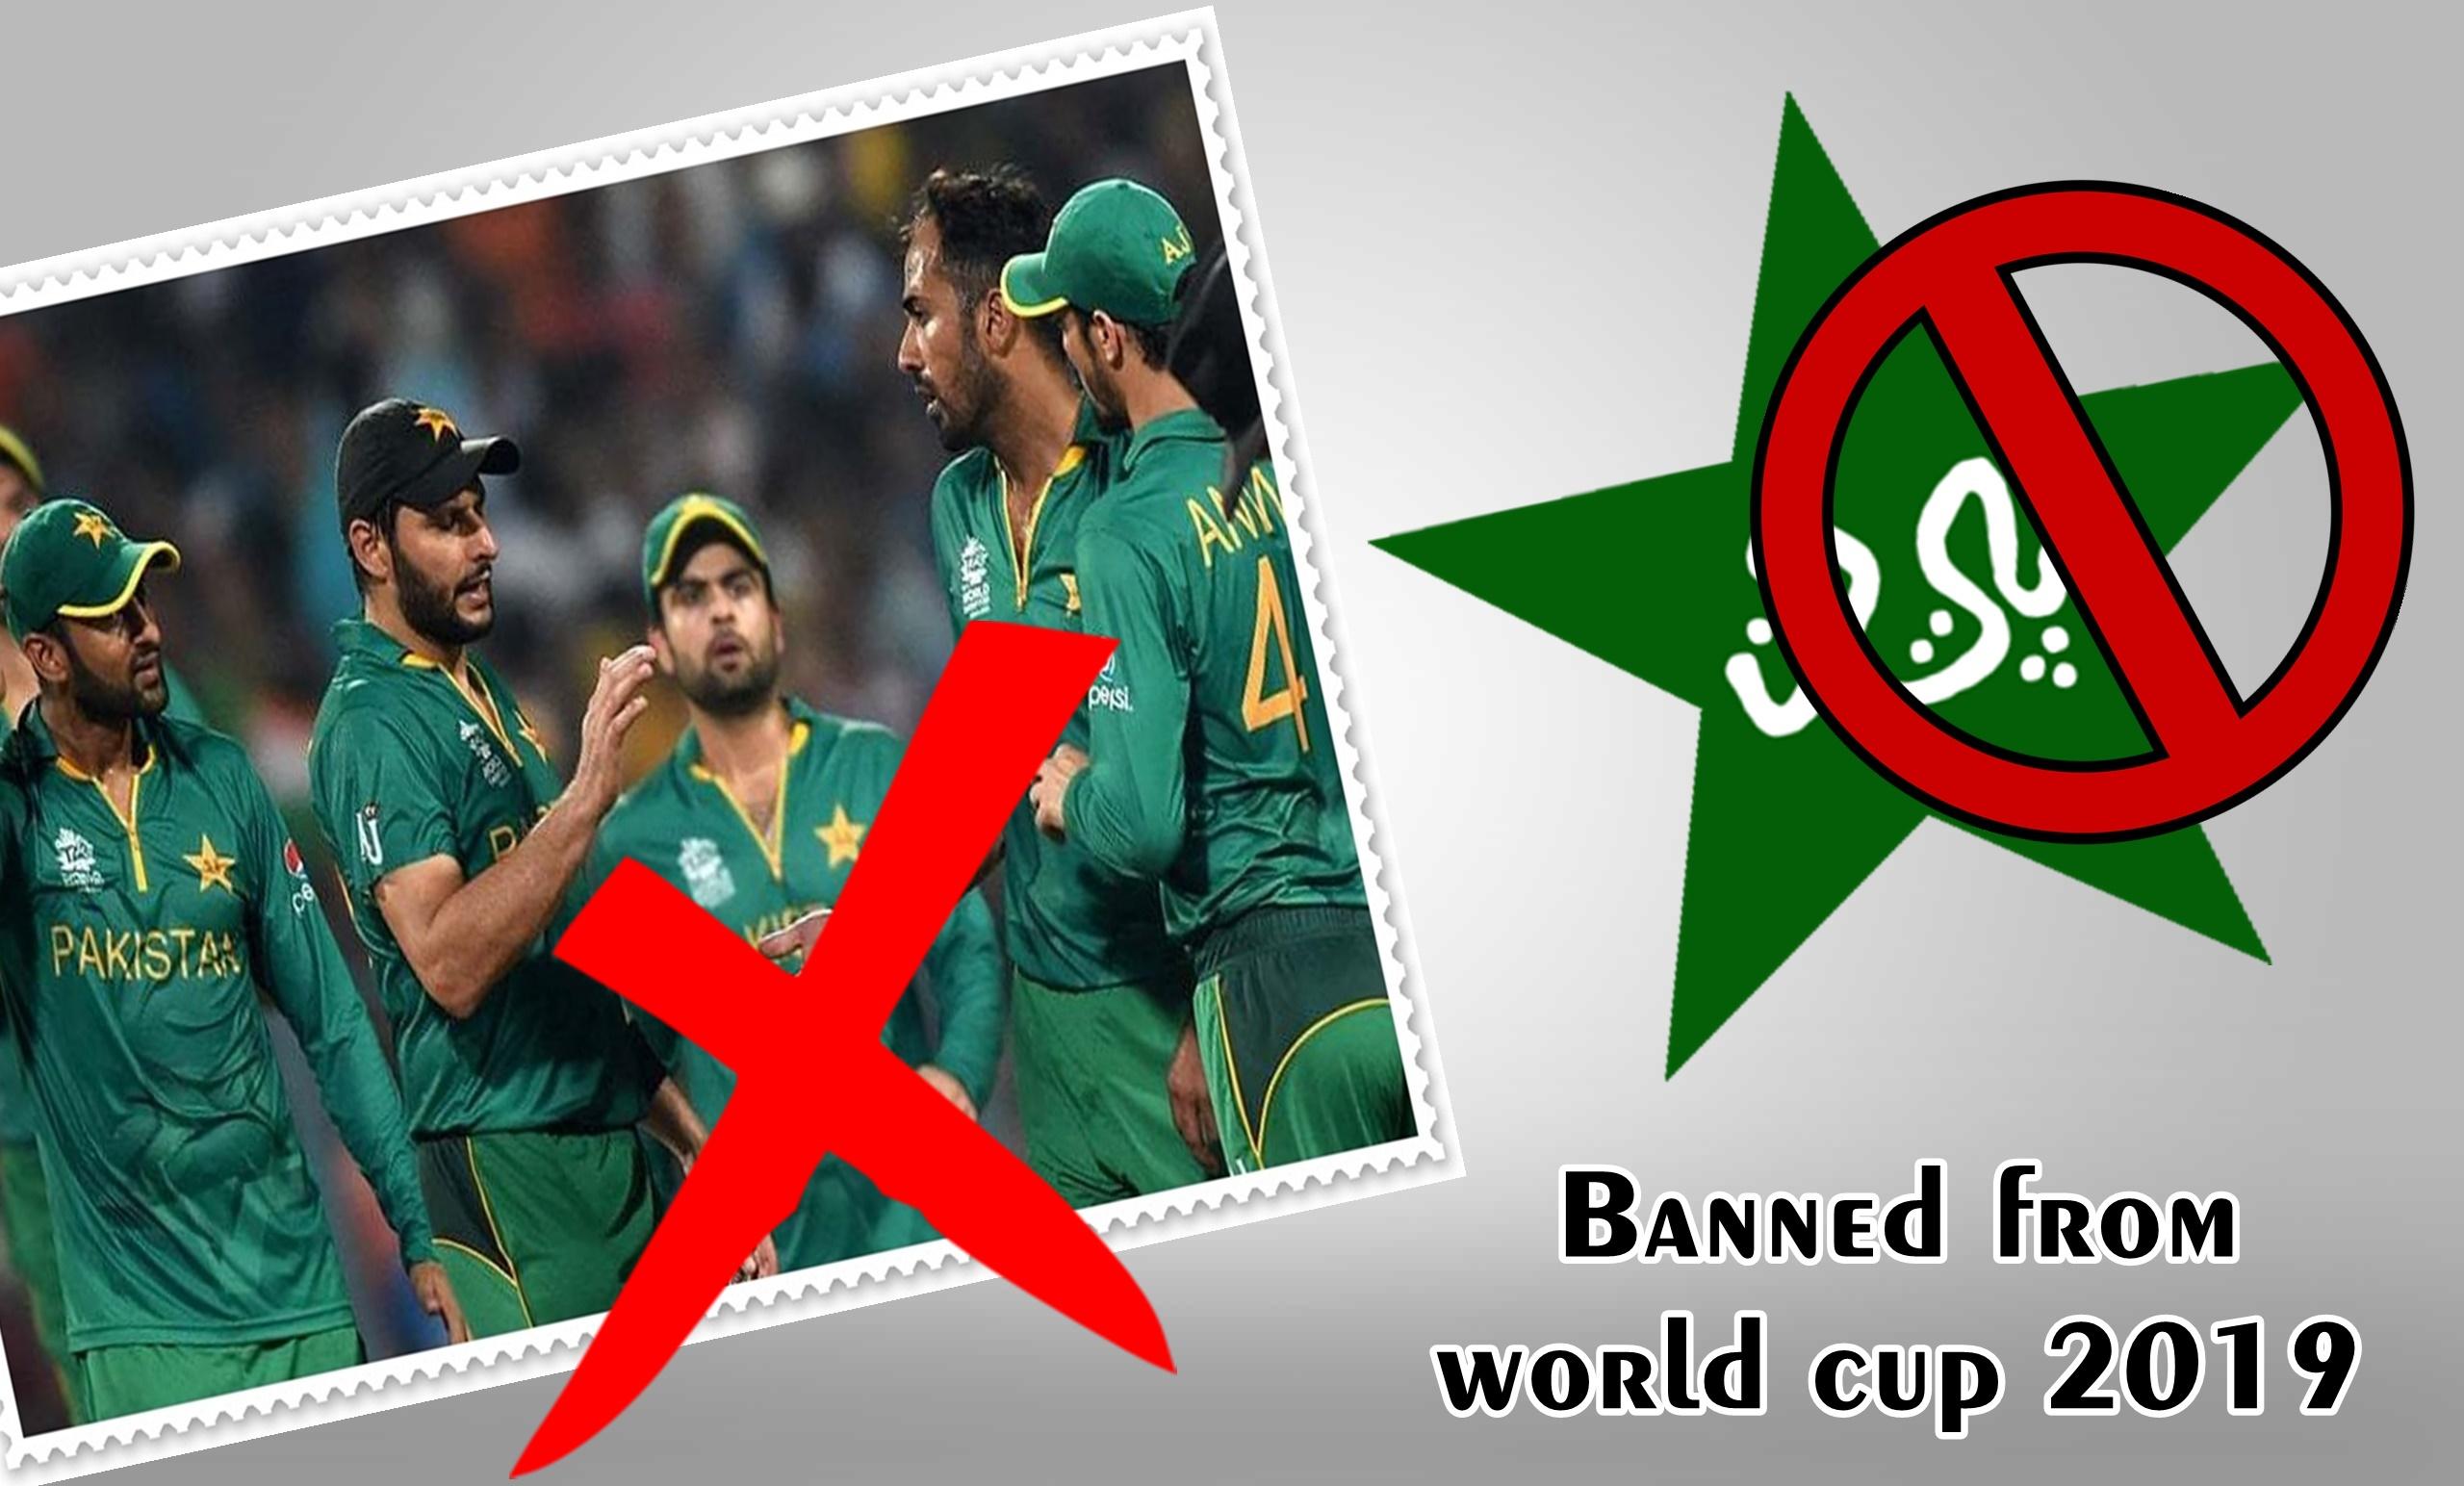 Best Toilet Paper 2019 Best Toilet Paper को Cricket World Cup 2019 से बाहर